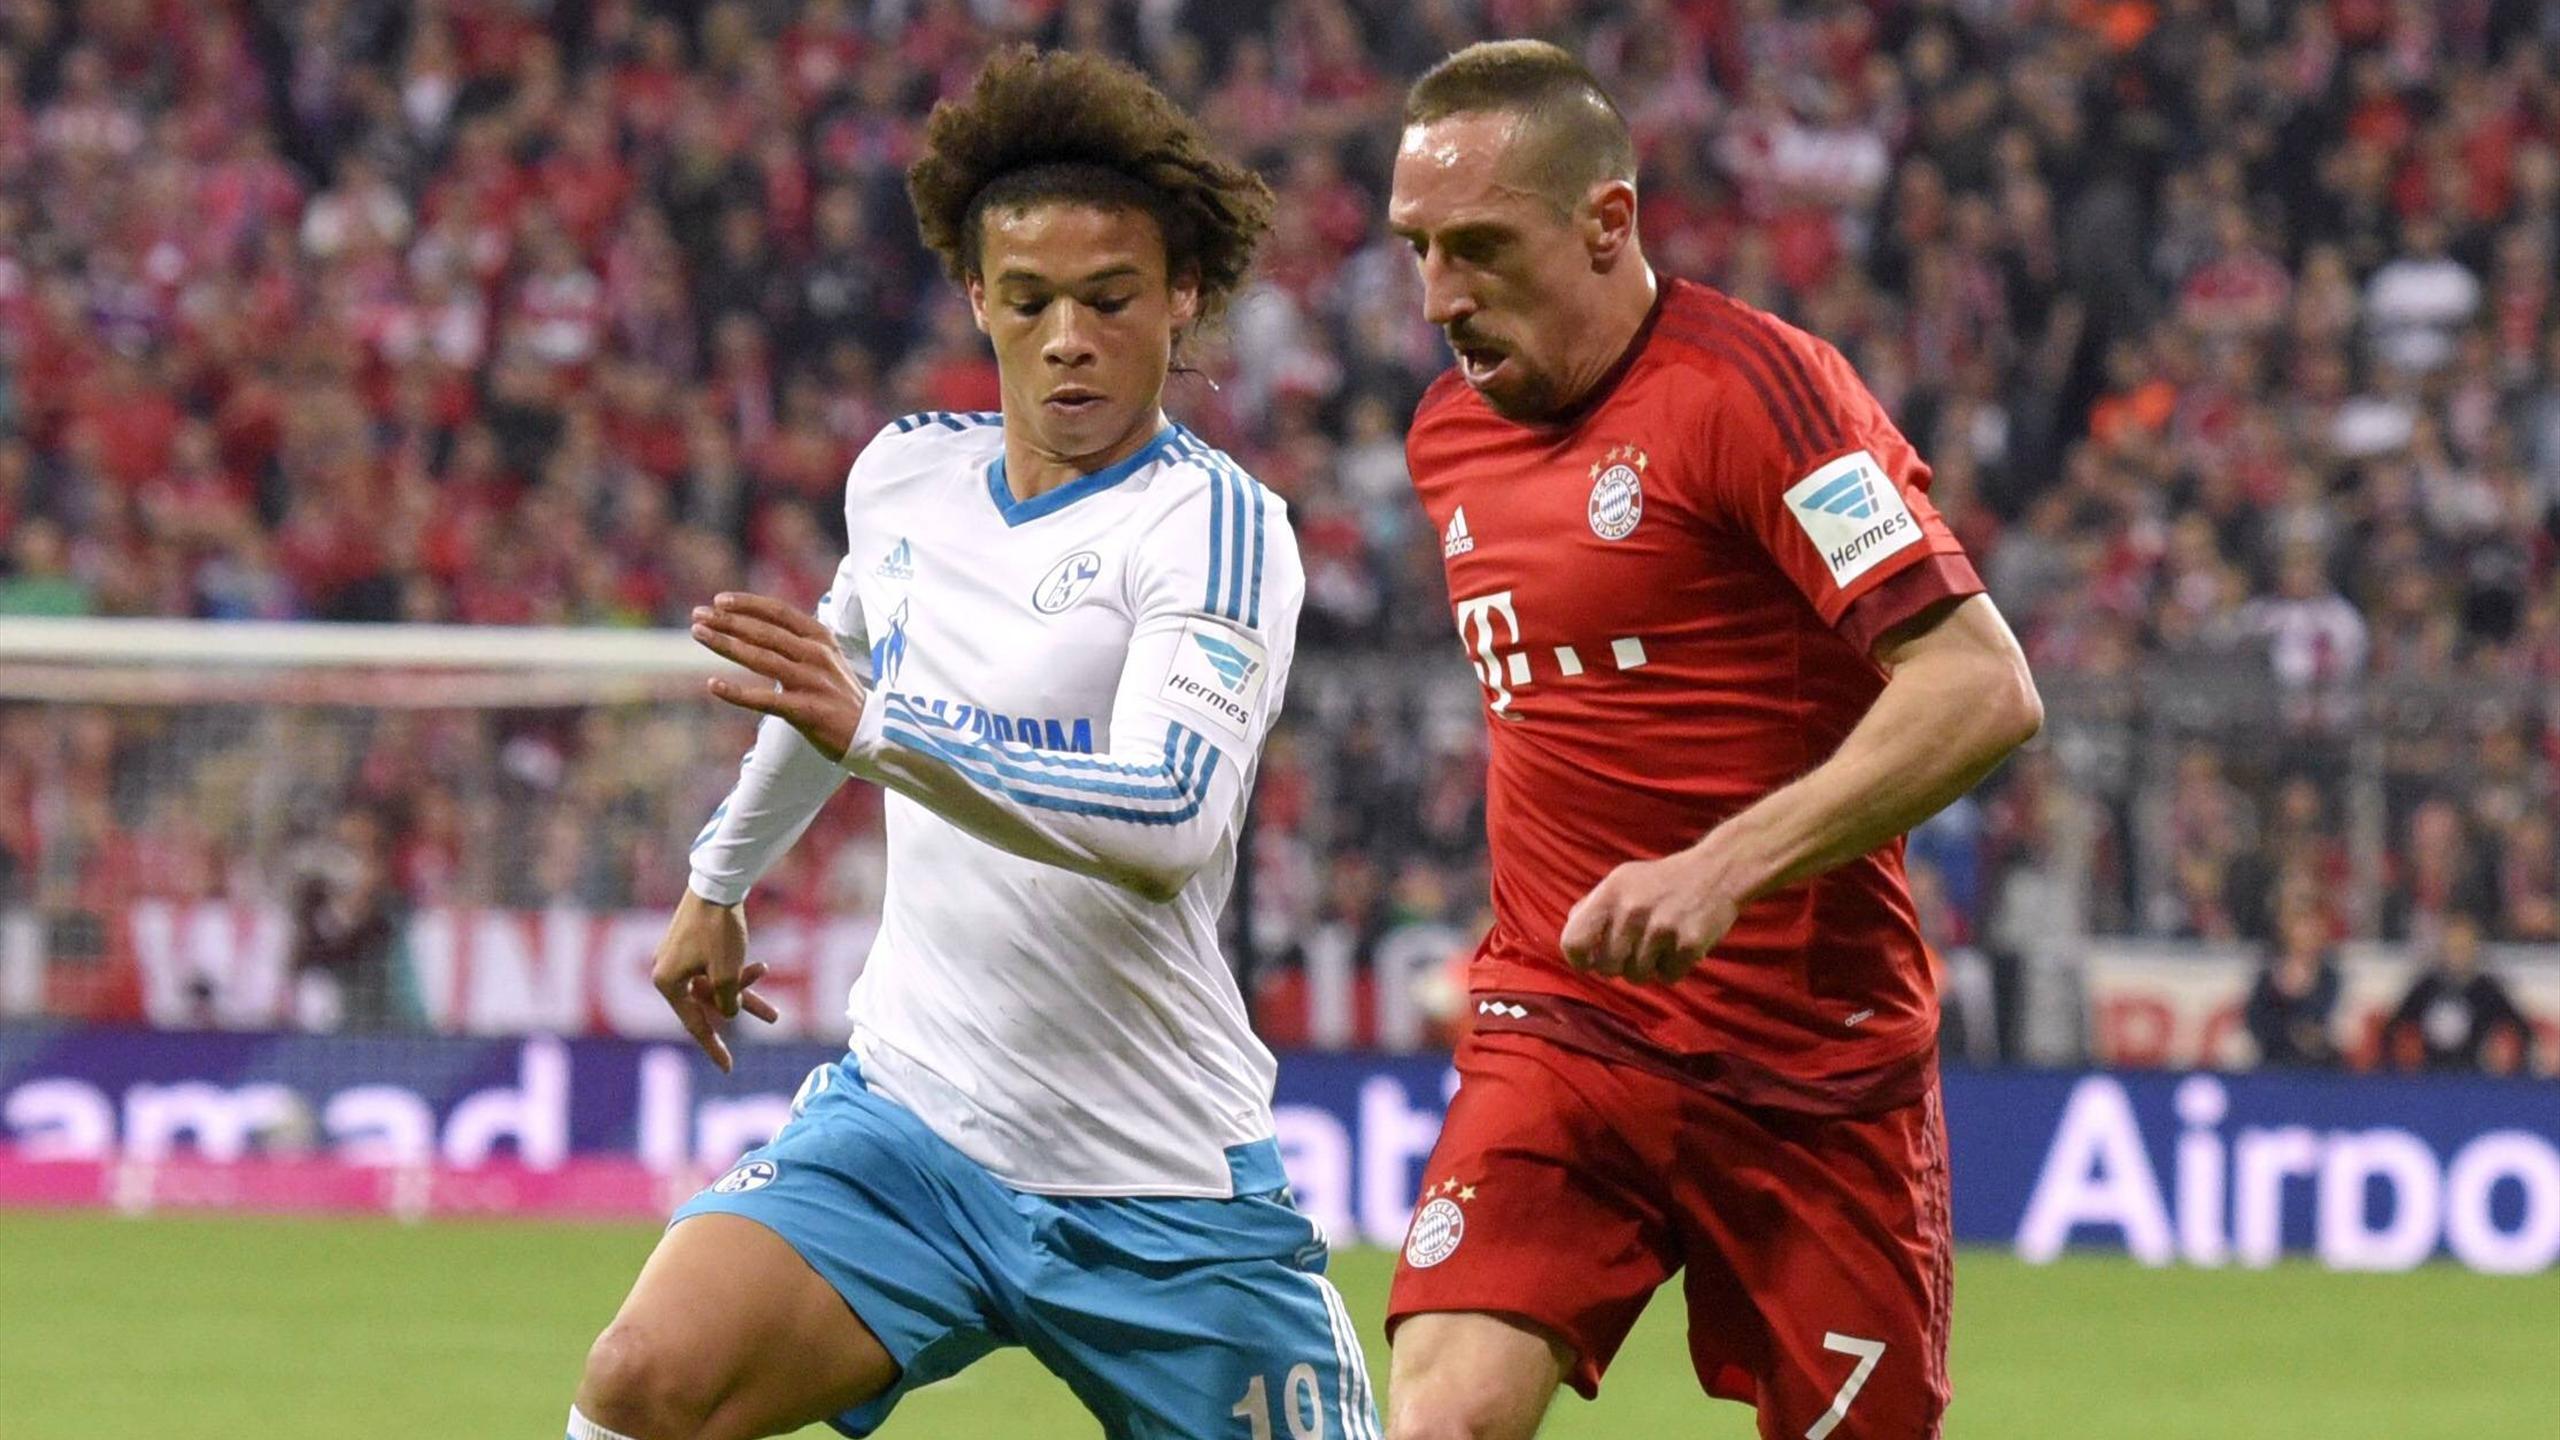 Leroy Sané au duel avec Franck Ribéry